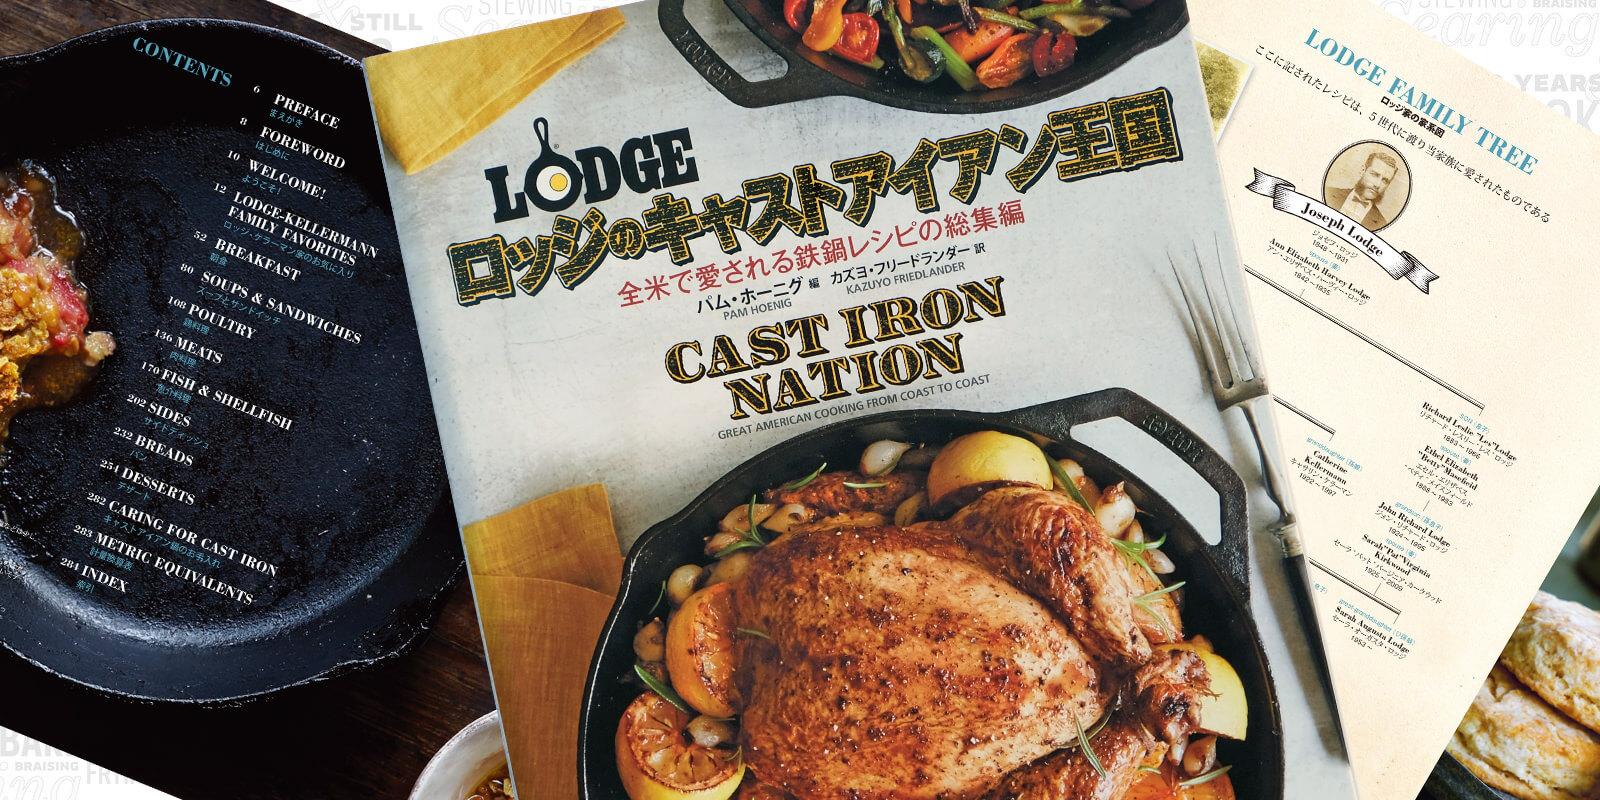 LODGE(ロッジ)|公式ブランドサイト